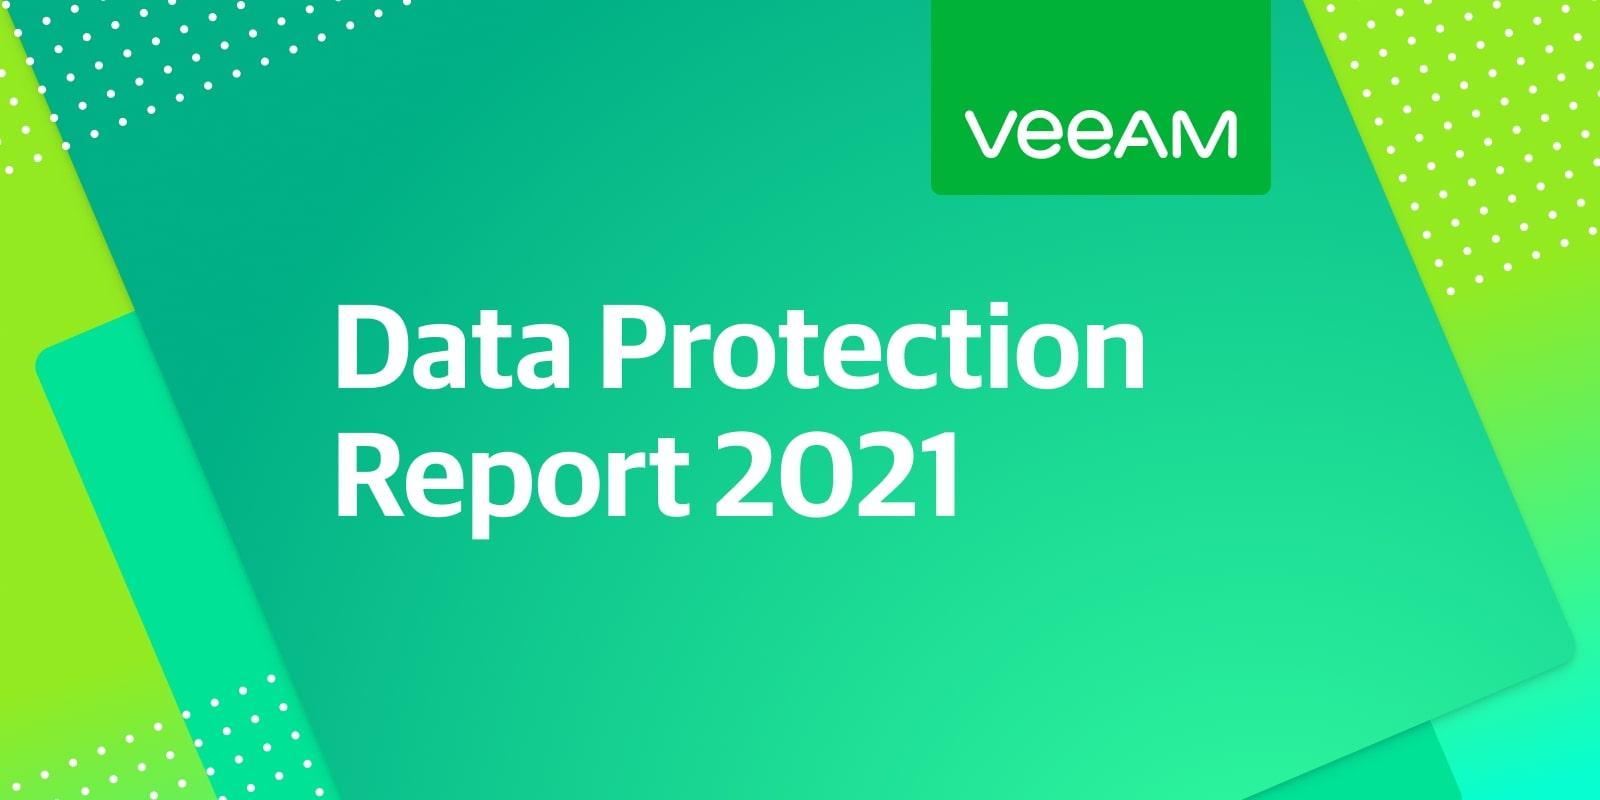 Veeam Data Protection Report